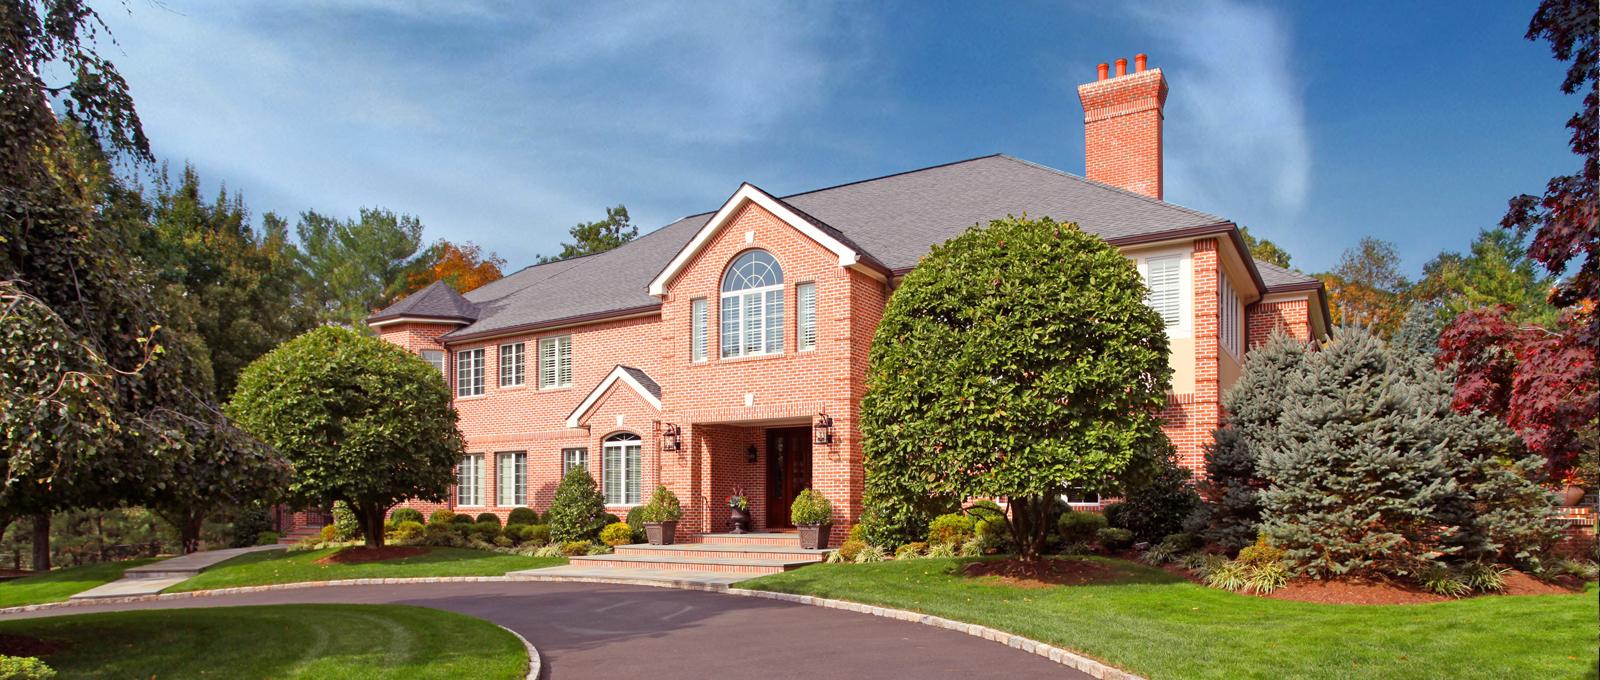 独户住宅 为 销售 在 Estate Area of Harrison 110 Polly Park Road Rye, 纽约州 10580 美国